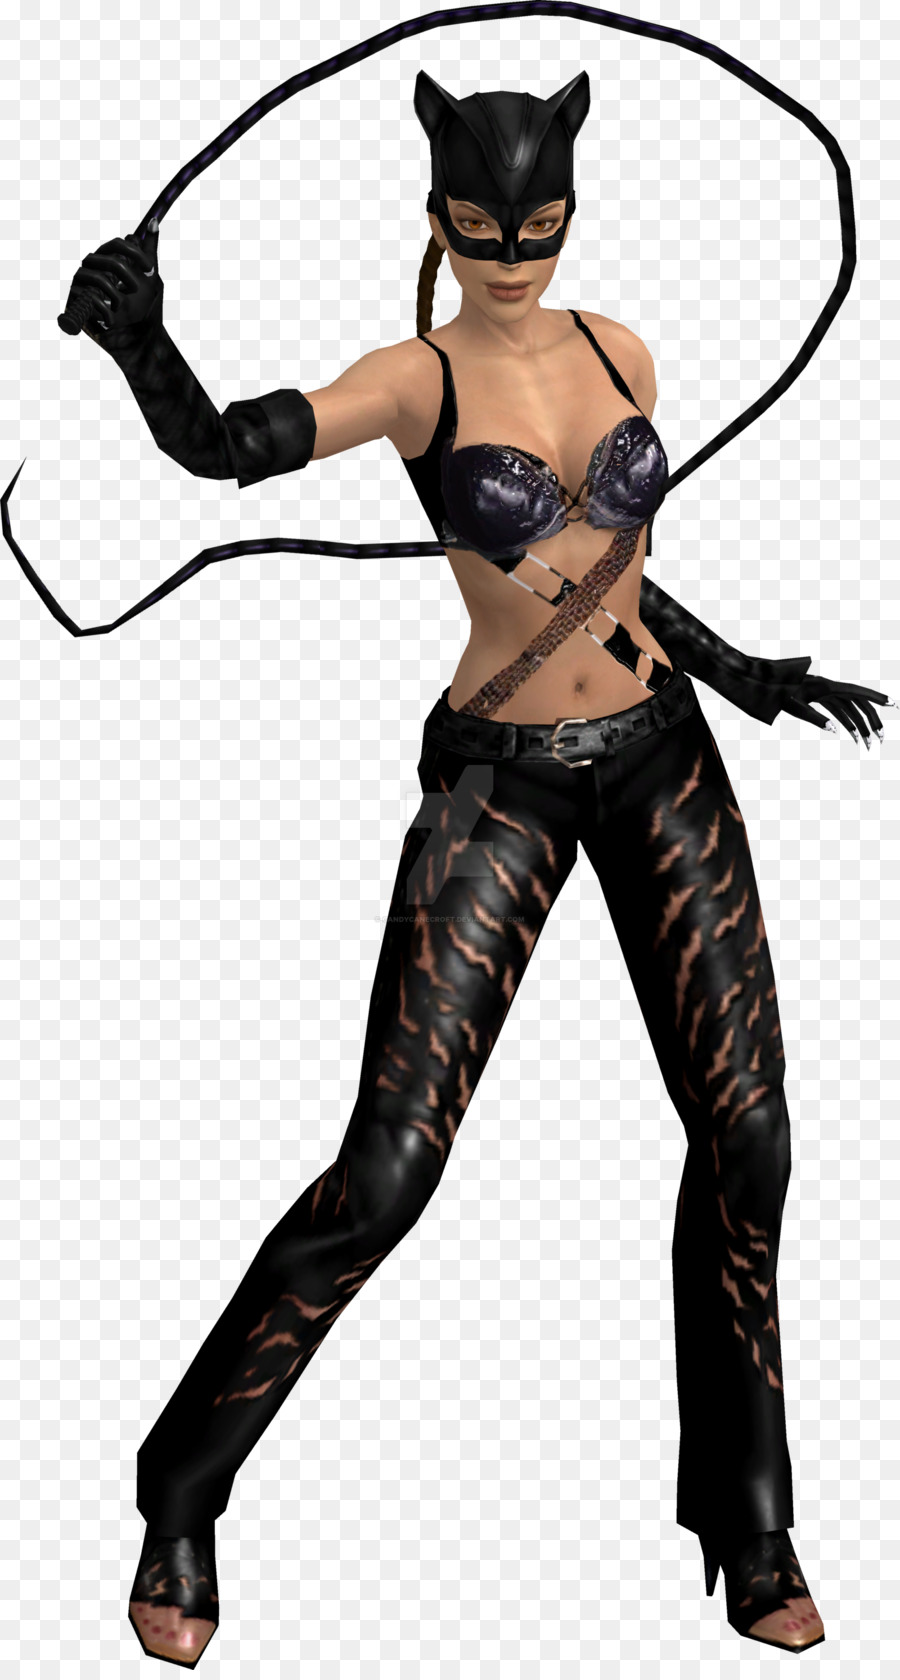 Catwoman Batman Arkham Knight Lara Croft Film - catwoman & Catwoman Batman: Arkham Knight Lara Croft Film - catwoman png ...